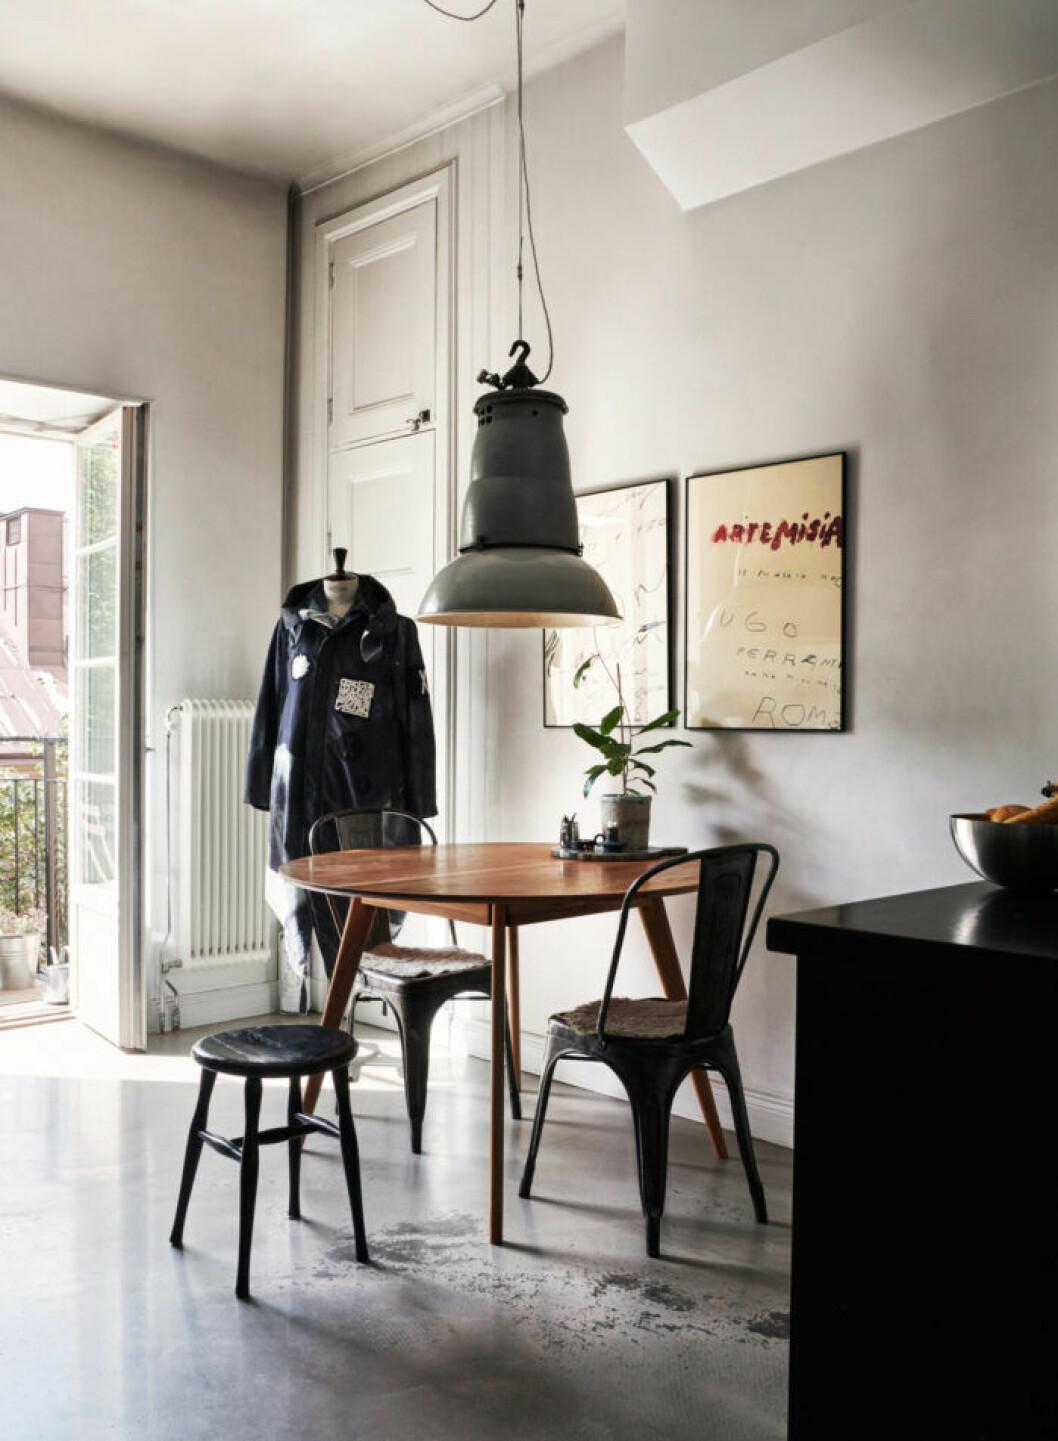 Stilrent kök hos modedesignern Lee Cotter i lägenheten i Stockholm